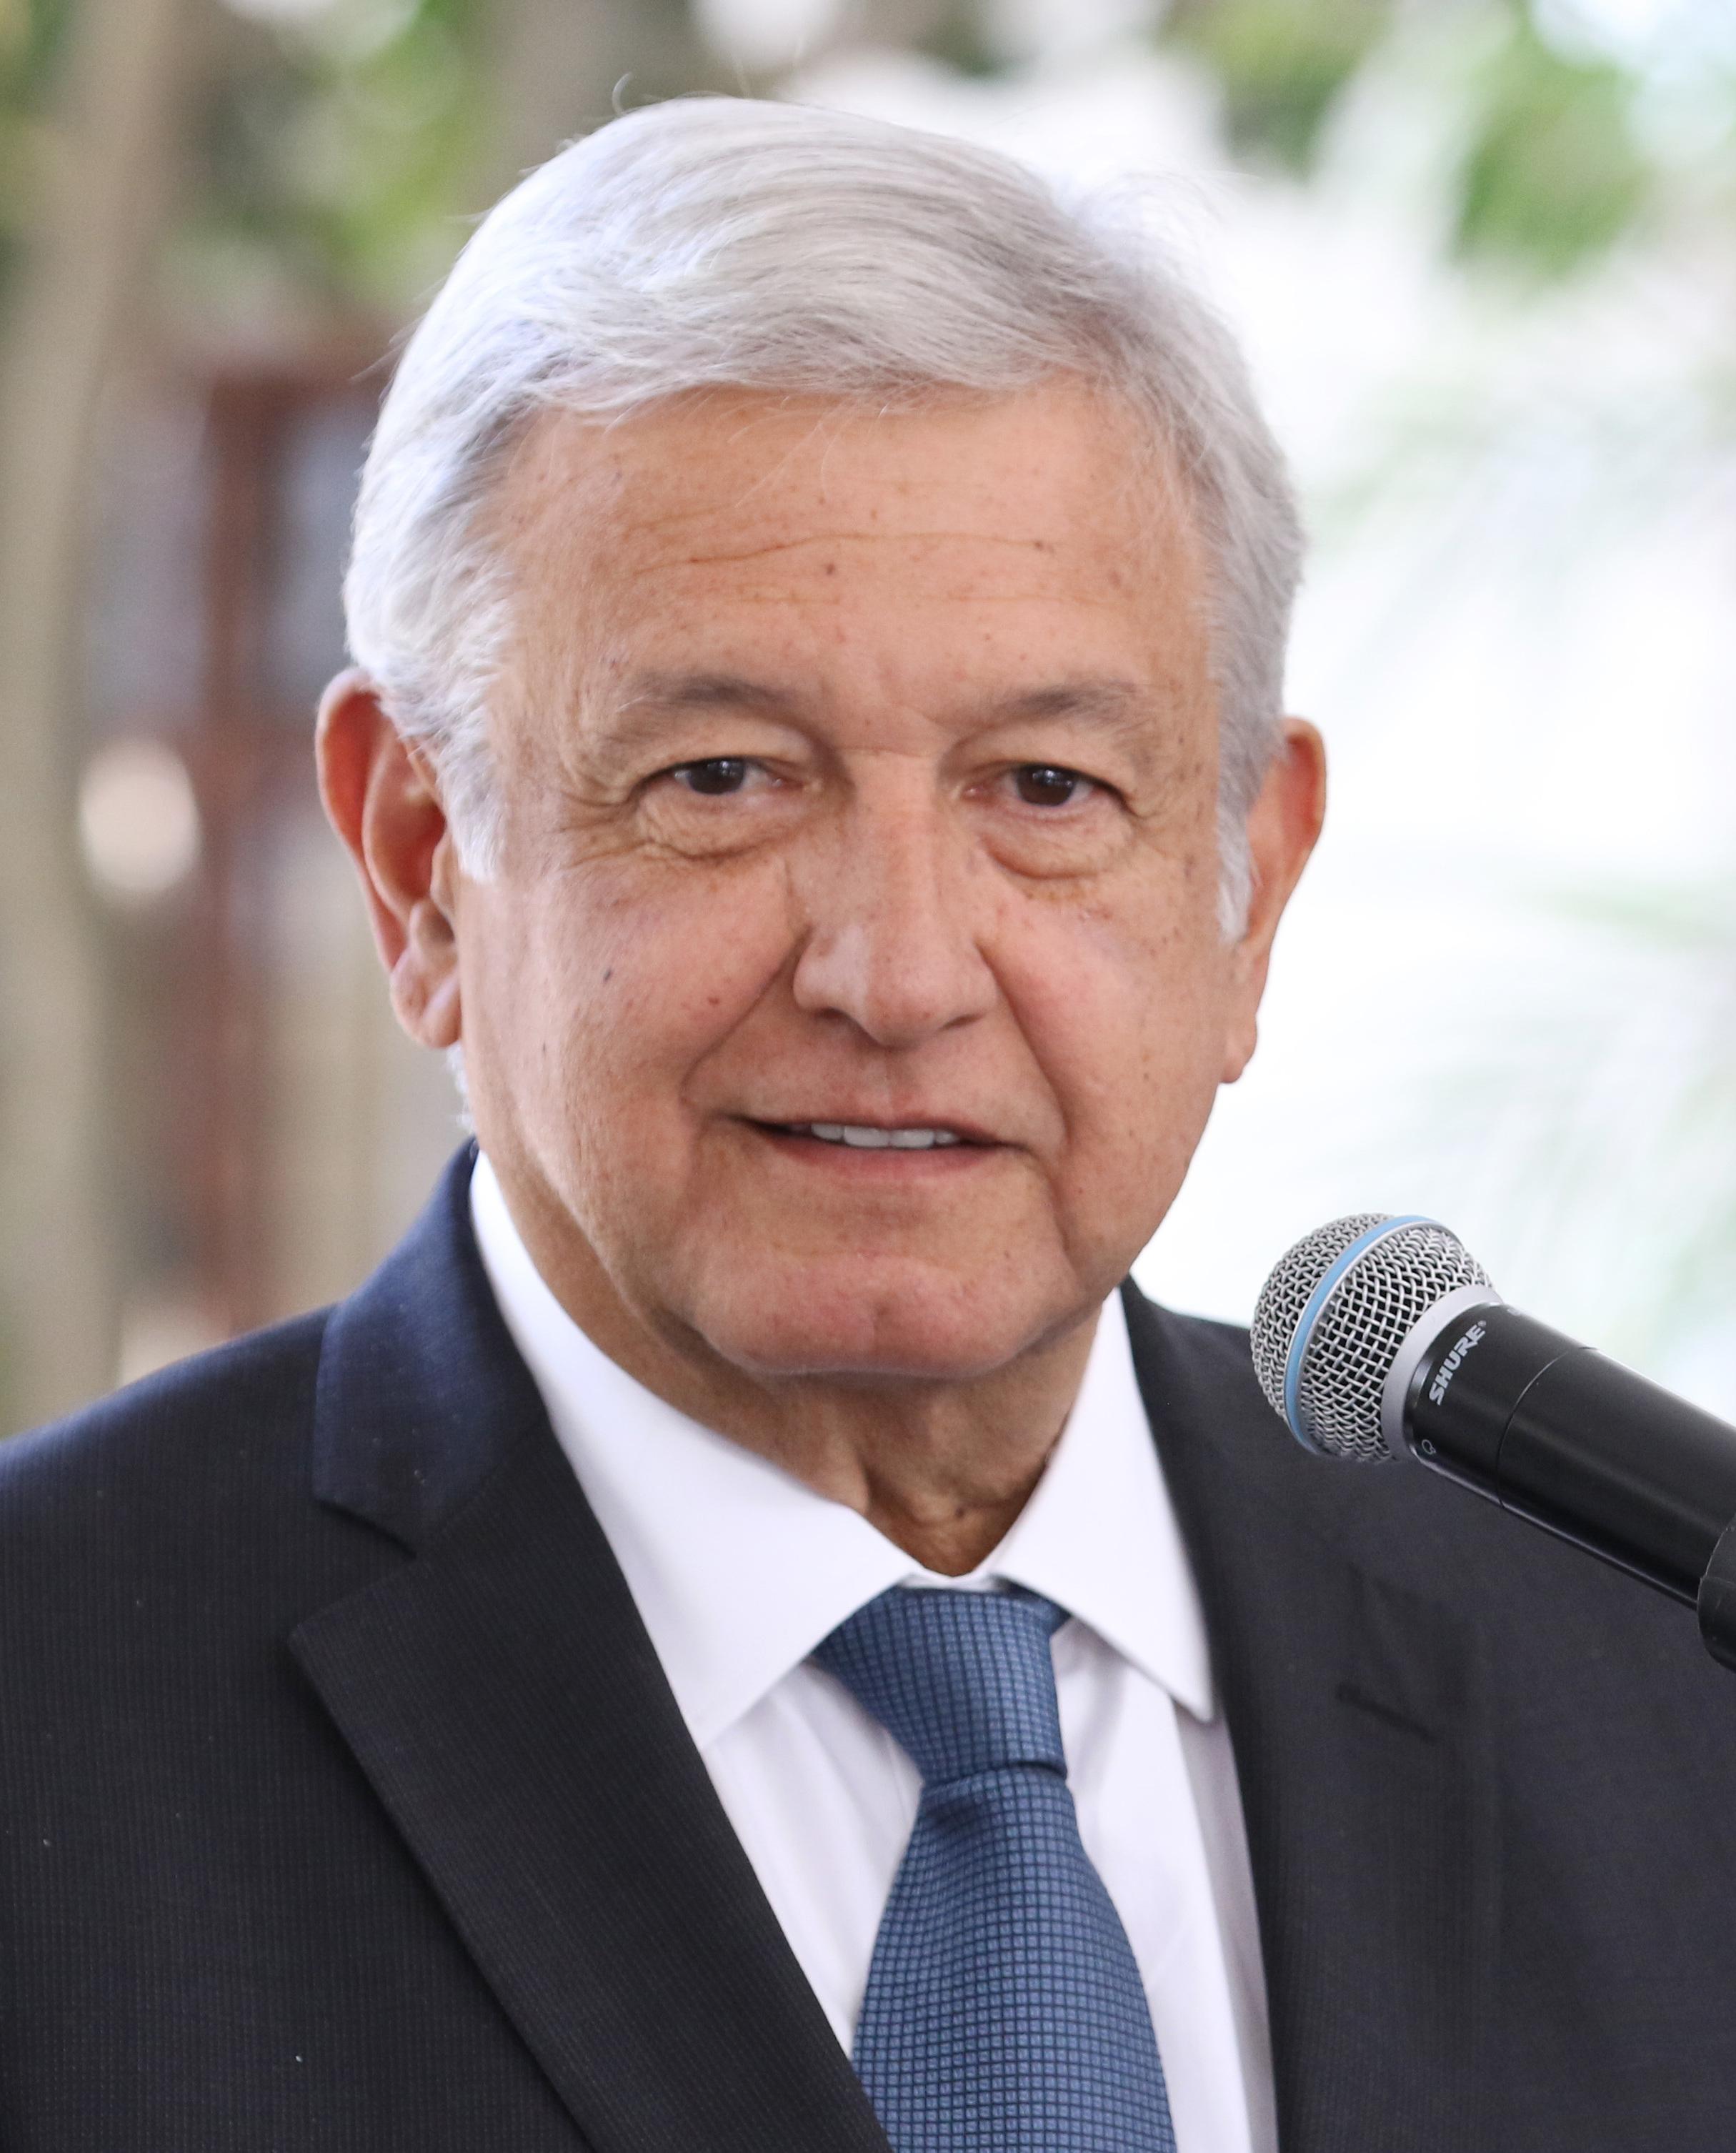 Andres Manuel Lopez Obrador Wikipedia